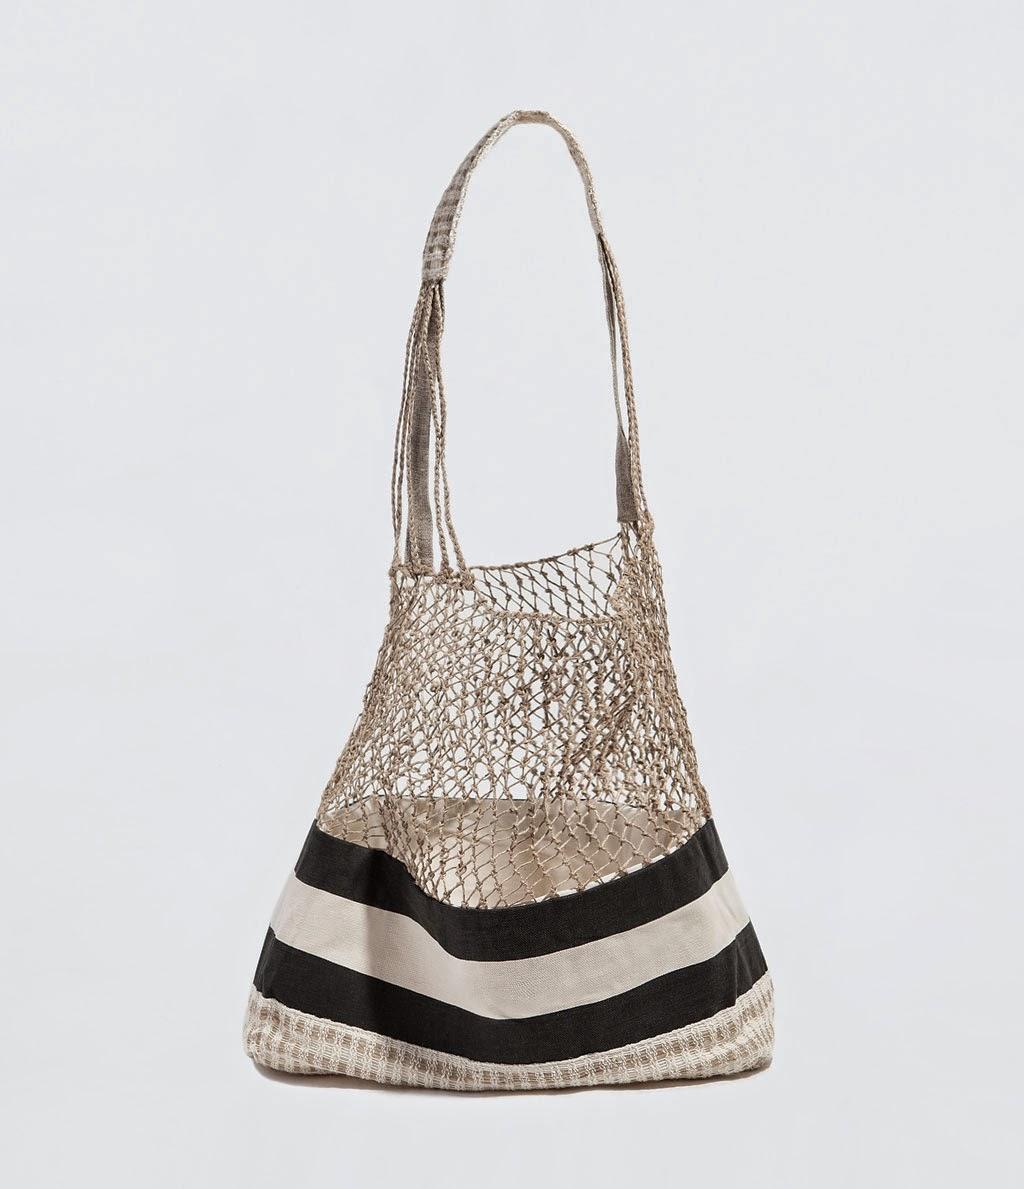 Bolsa conbinada tejidos, Zara, street style, fashion style